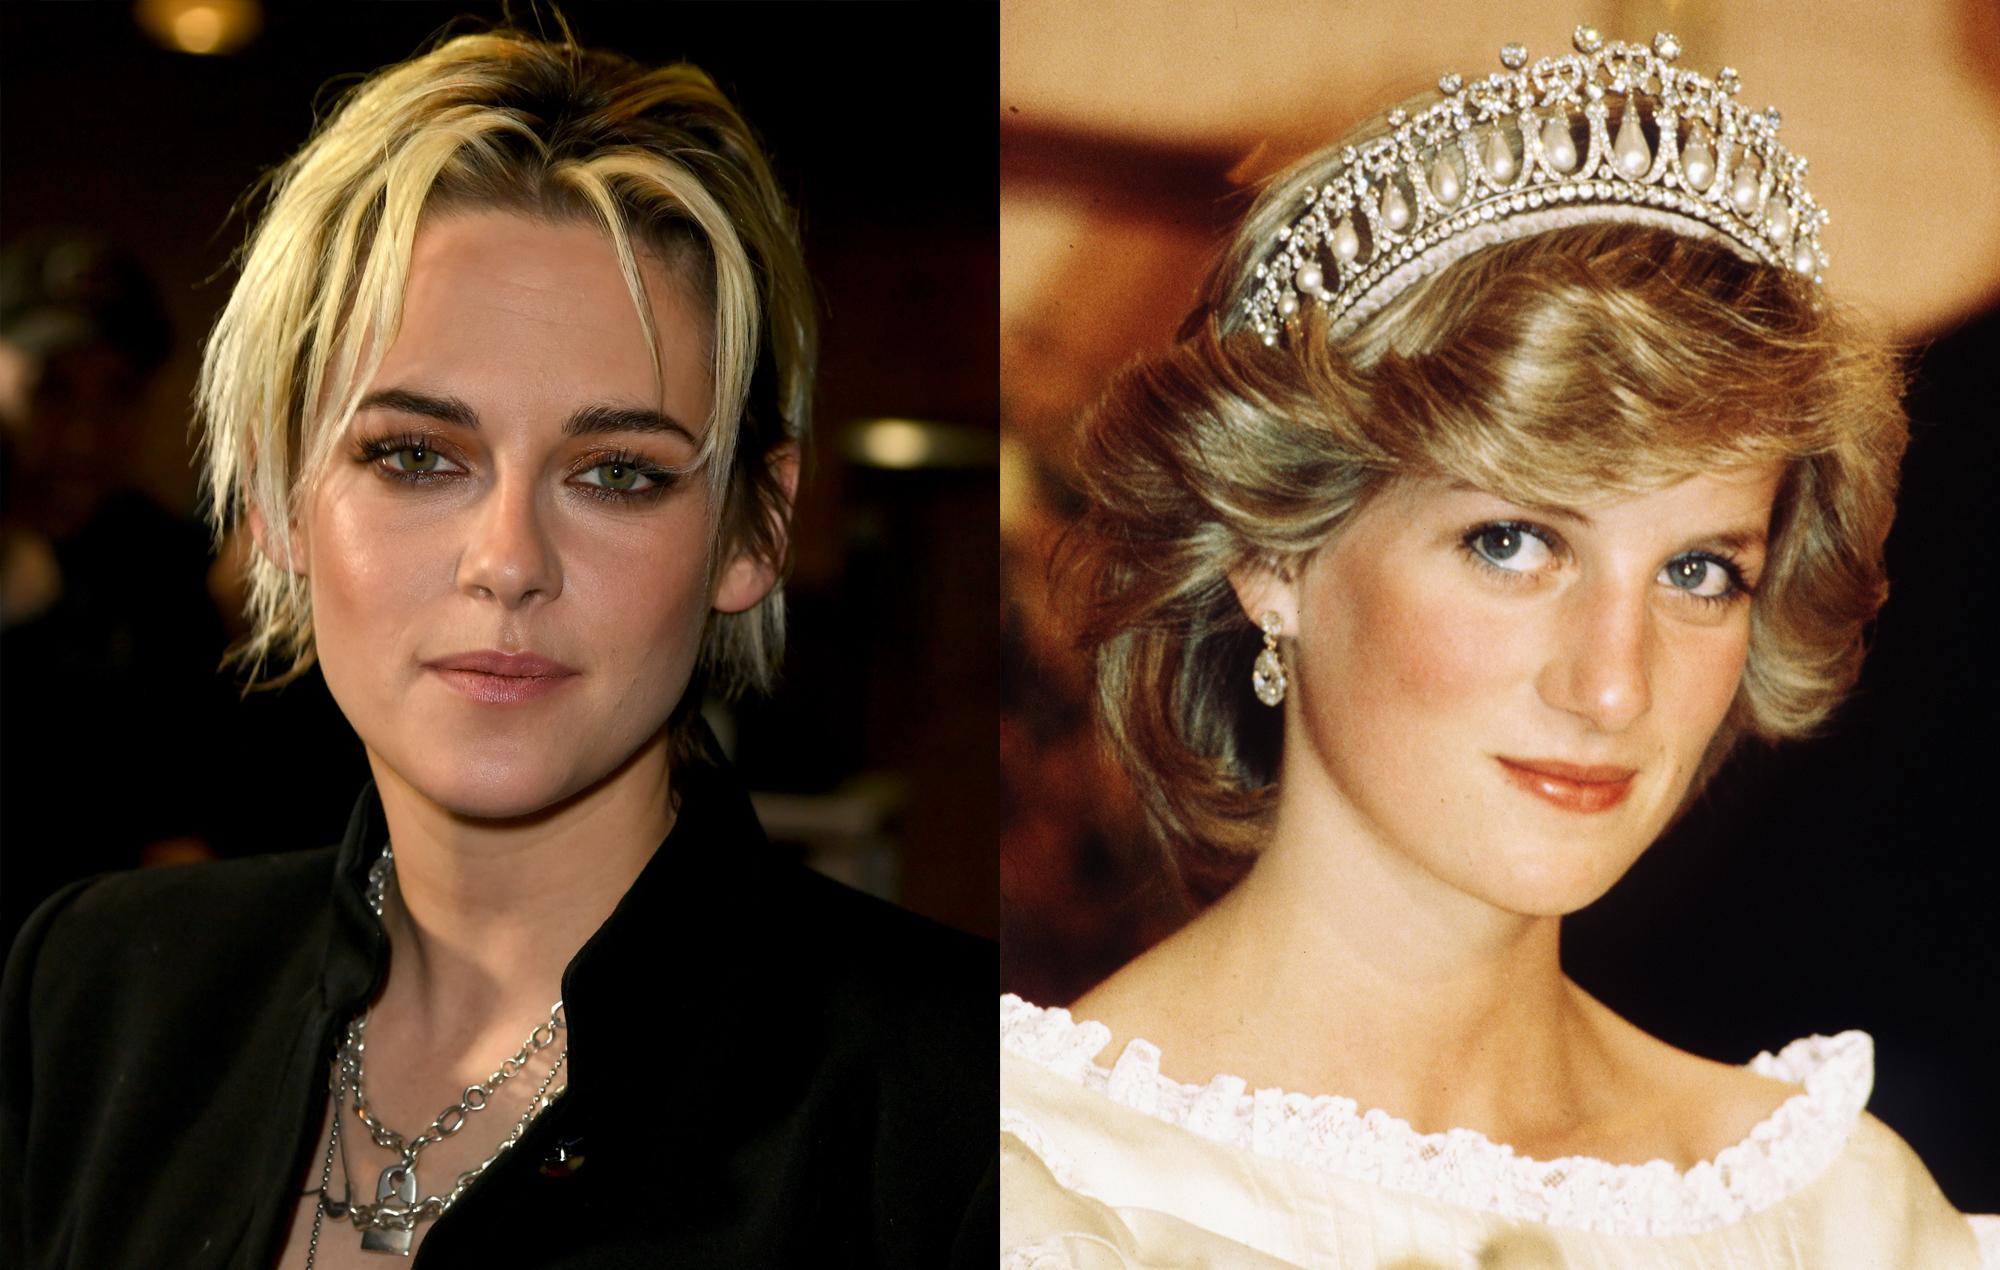 Kristen Stewart set to play Princess Diana in Pablo Larraín's new film